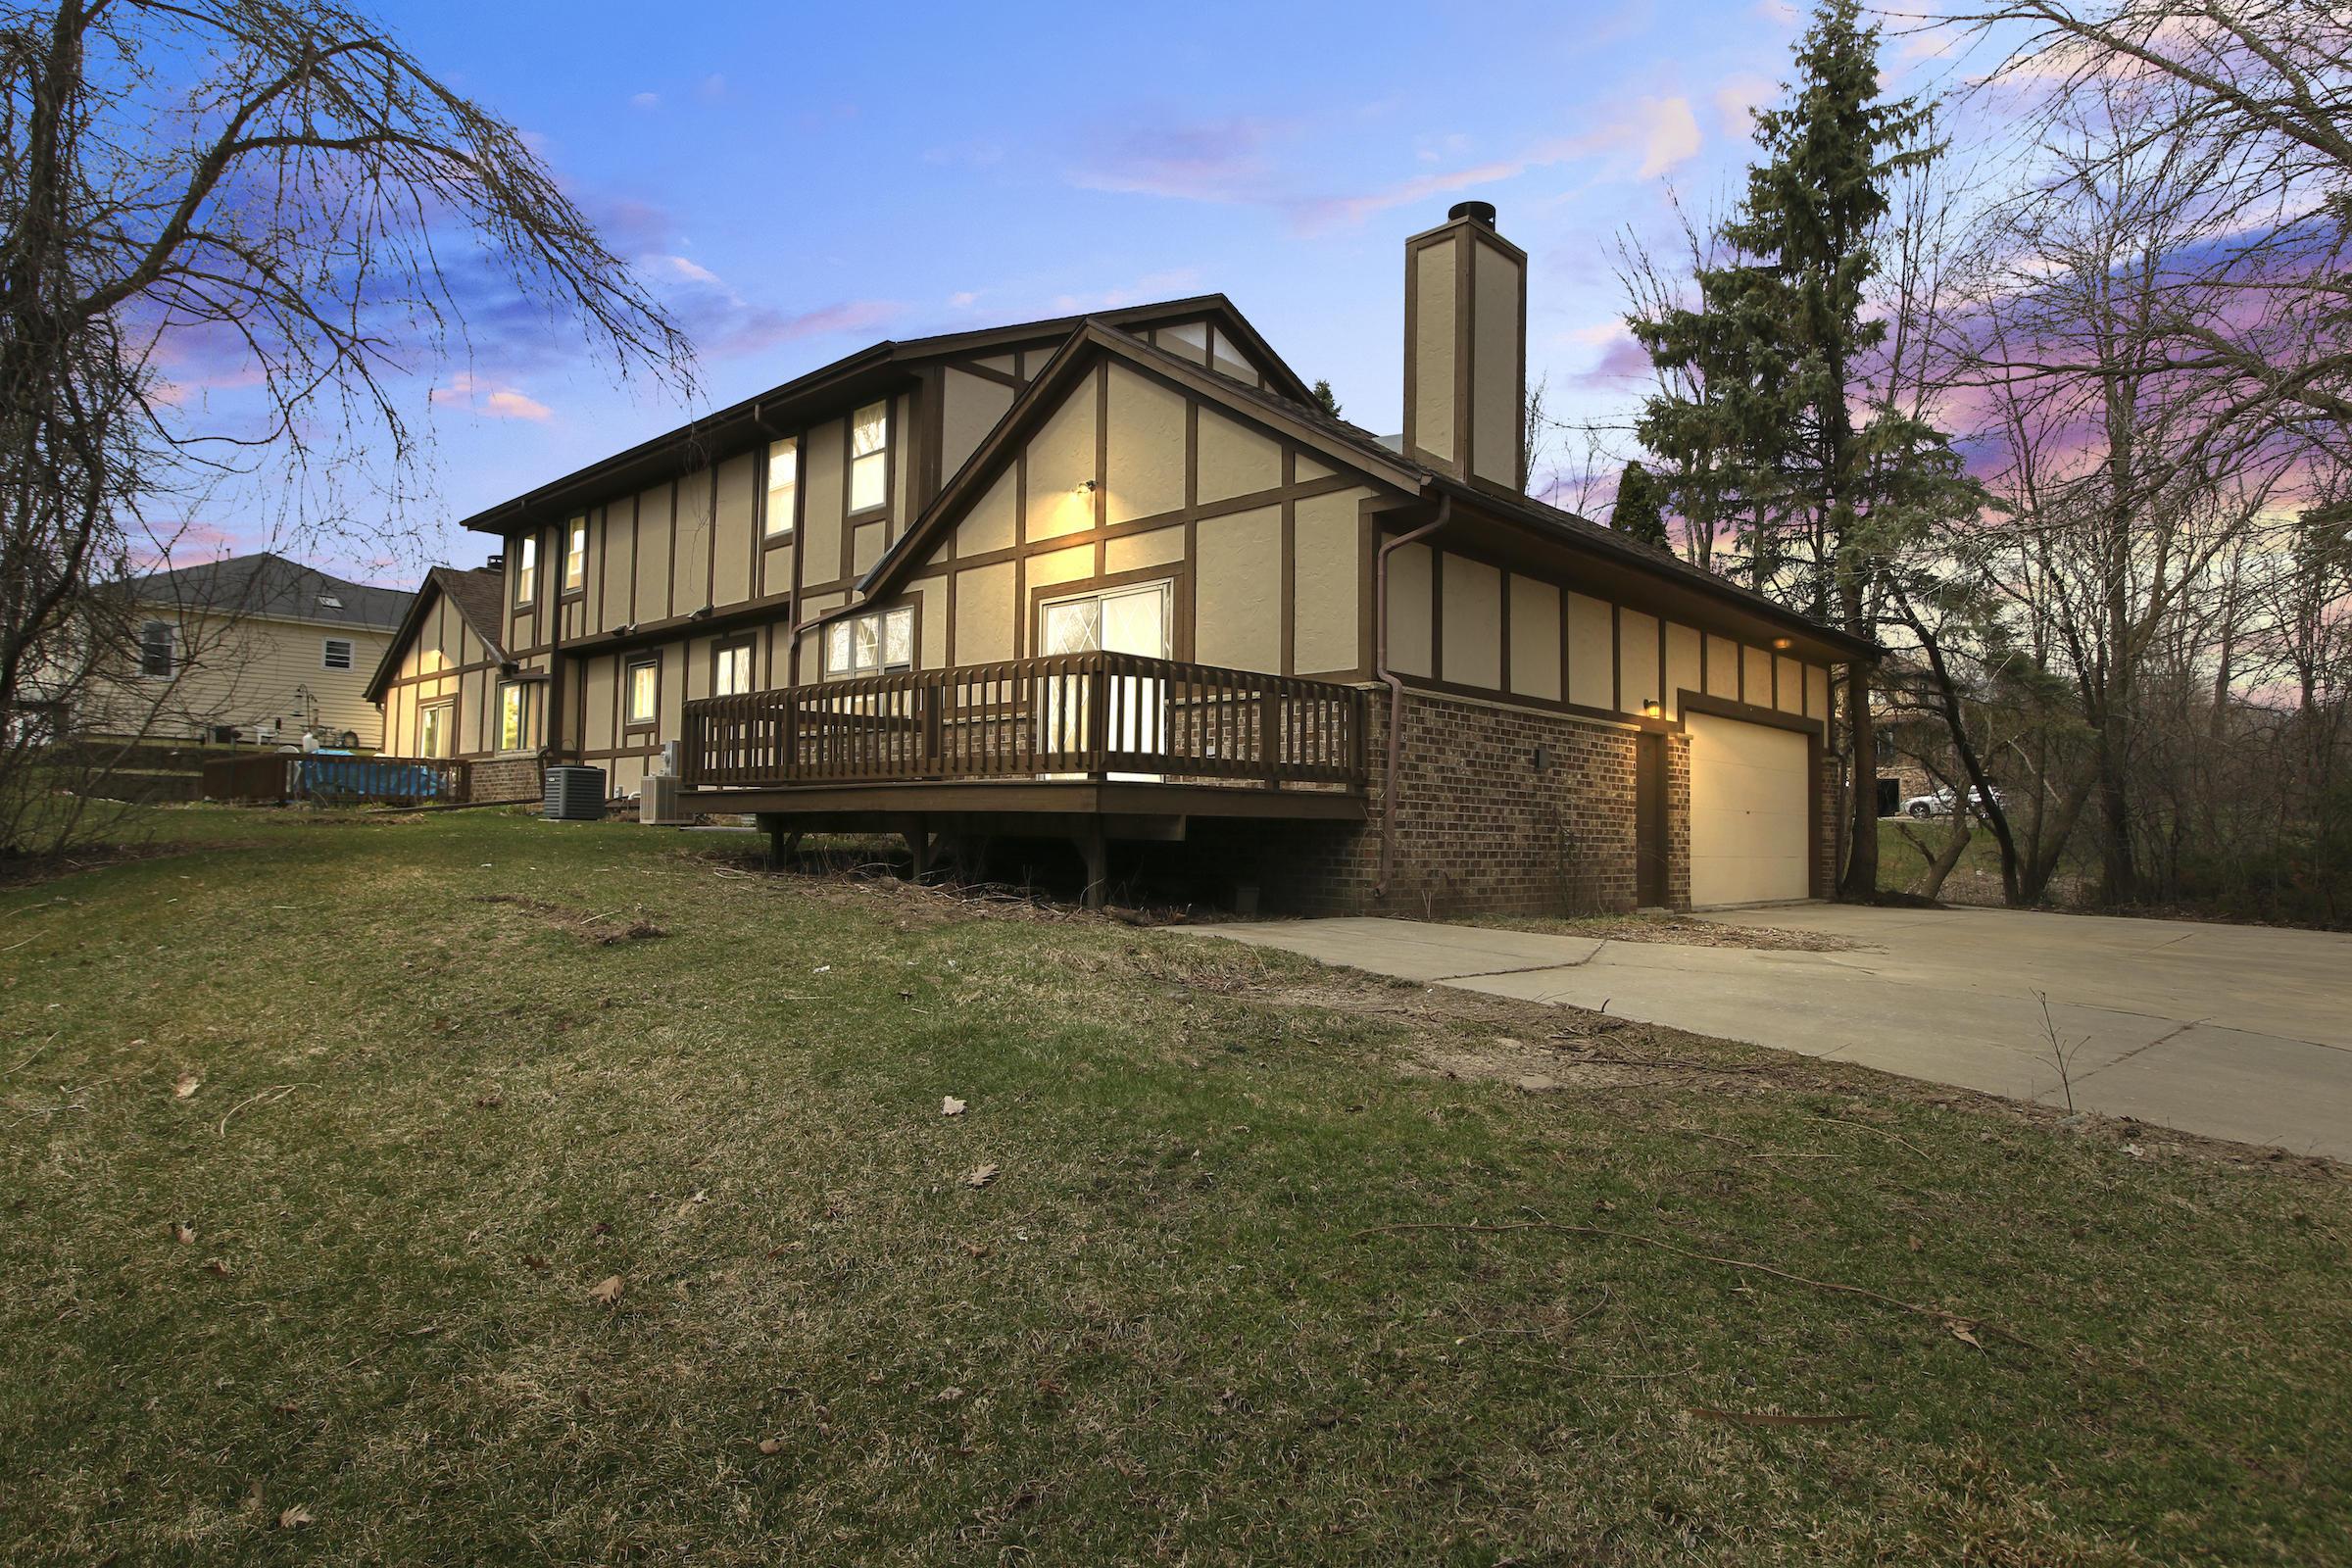 18835 Emerald Dr, Brookfield, Wisconsin 53045, 2 Bedrooms Bedrooms, 6 Rooms Rooms,2 BathroomsBathrooms,Condominiums,For Sale,Emerald Dr,2,1683837